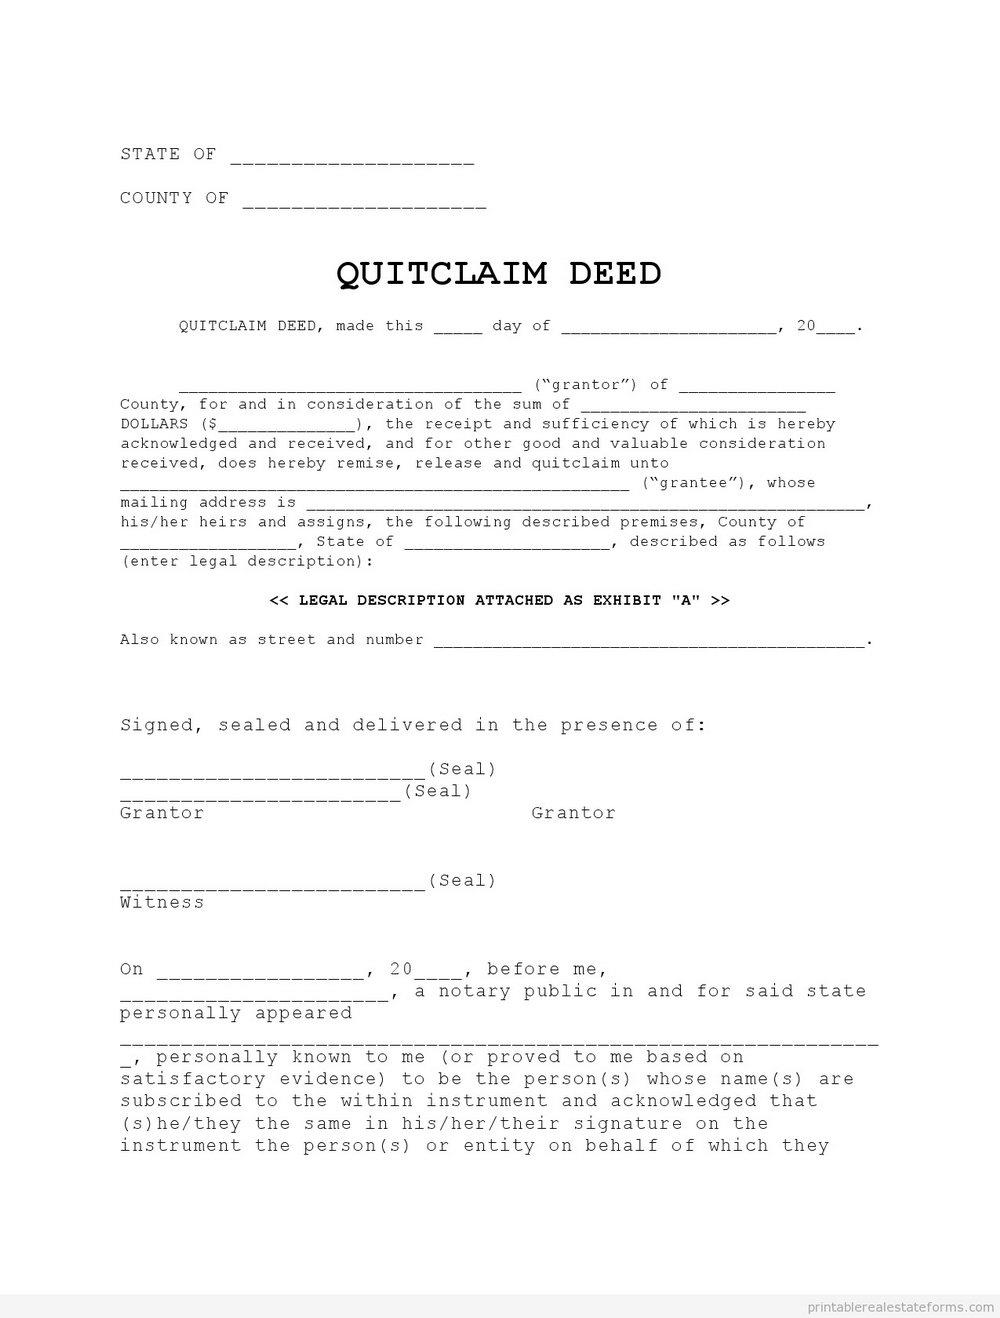 Quit Deed Claim Form